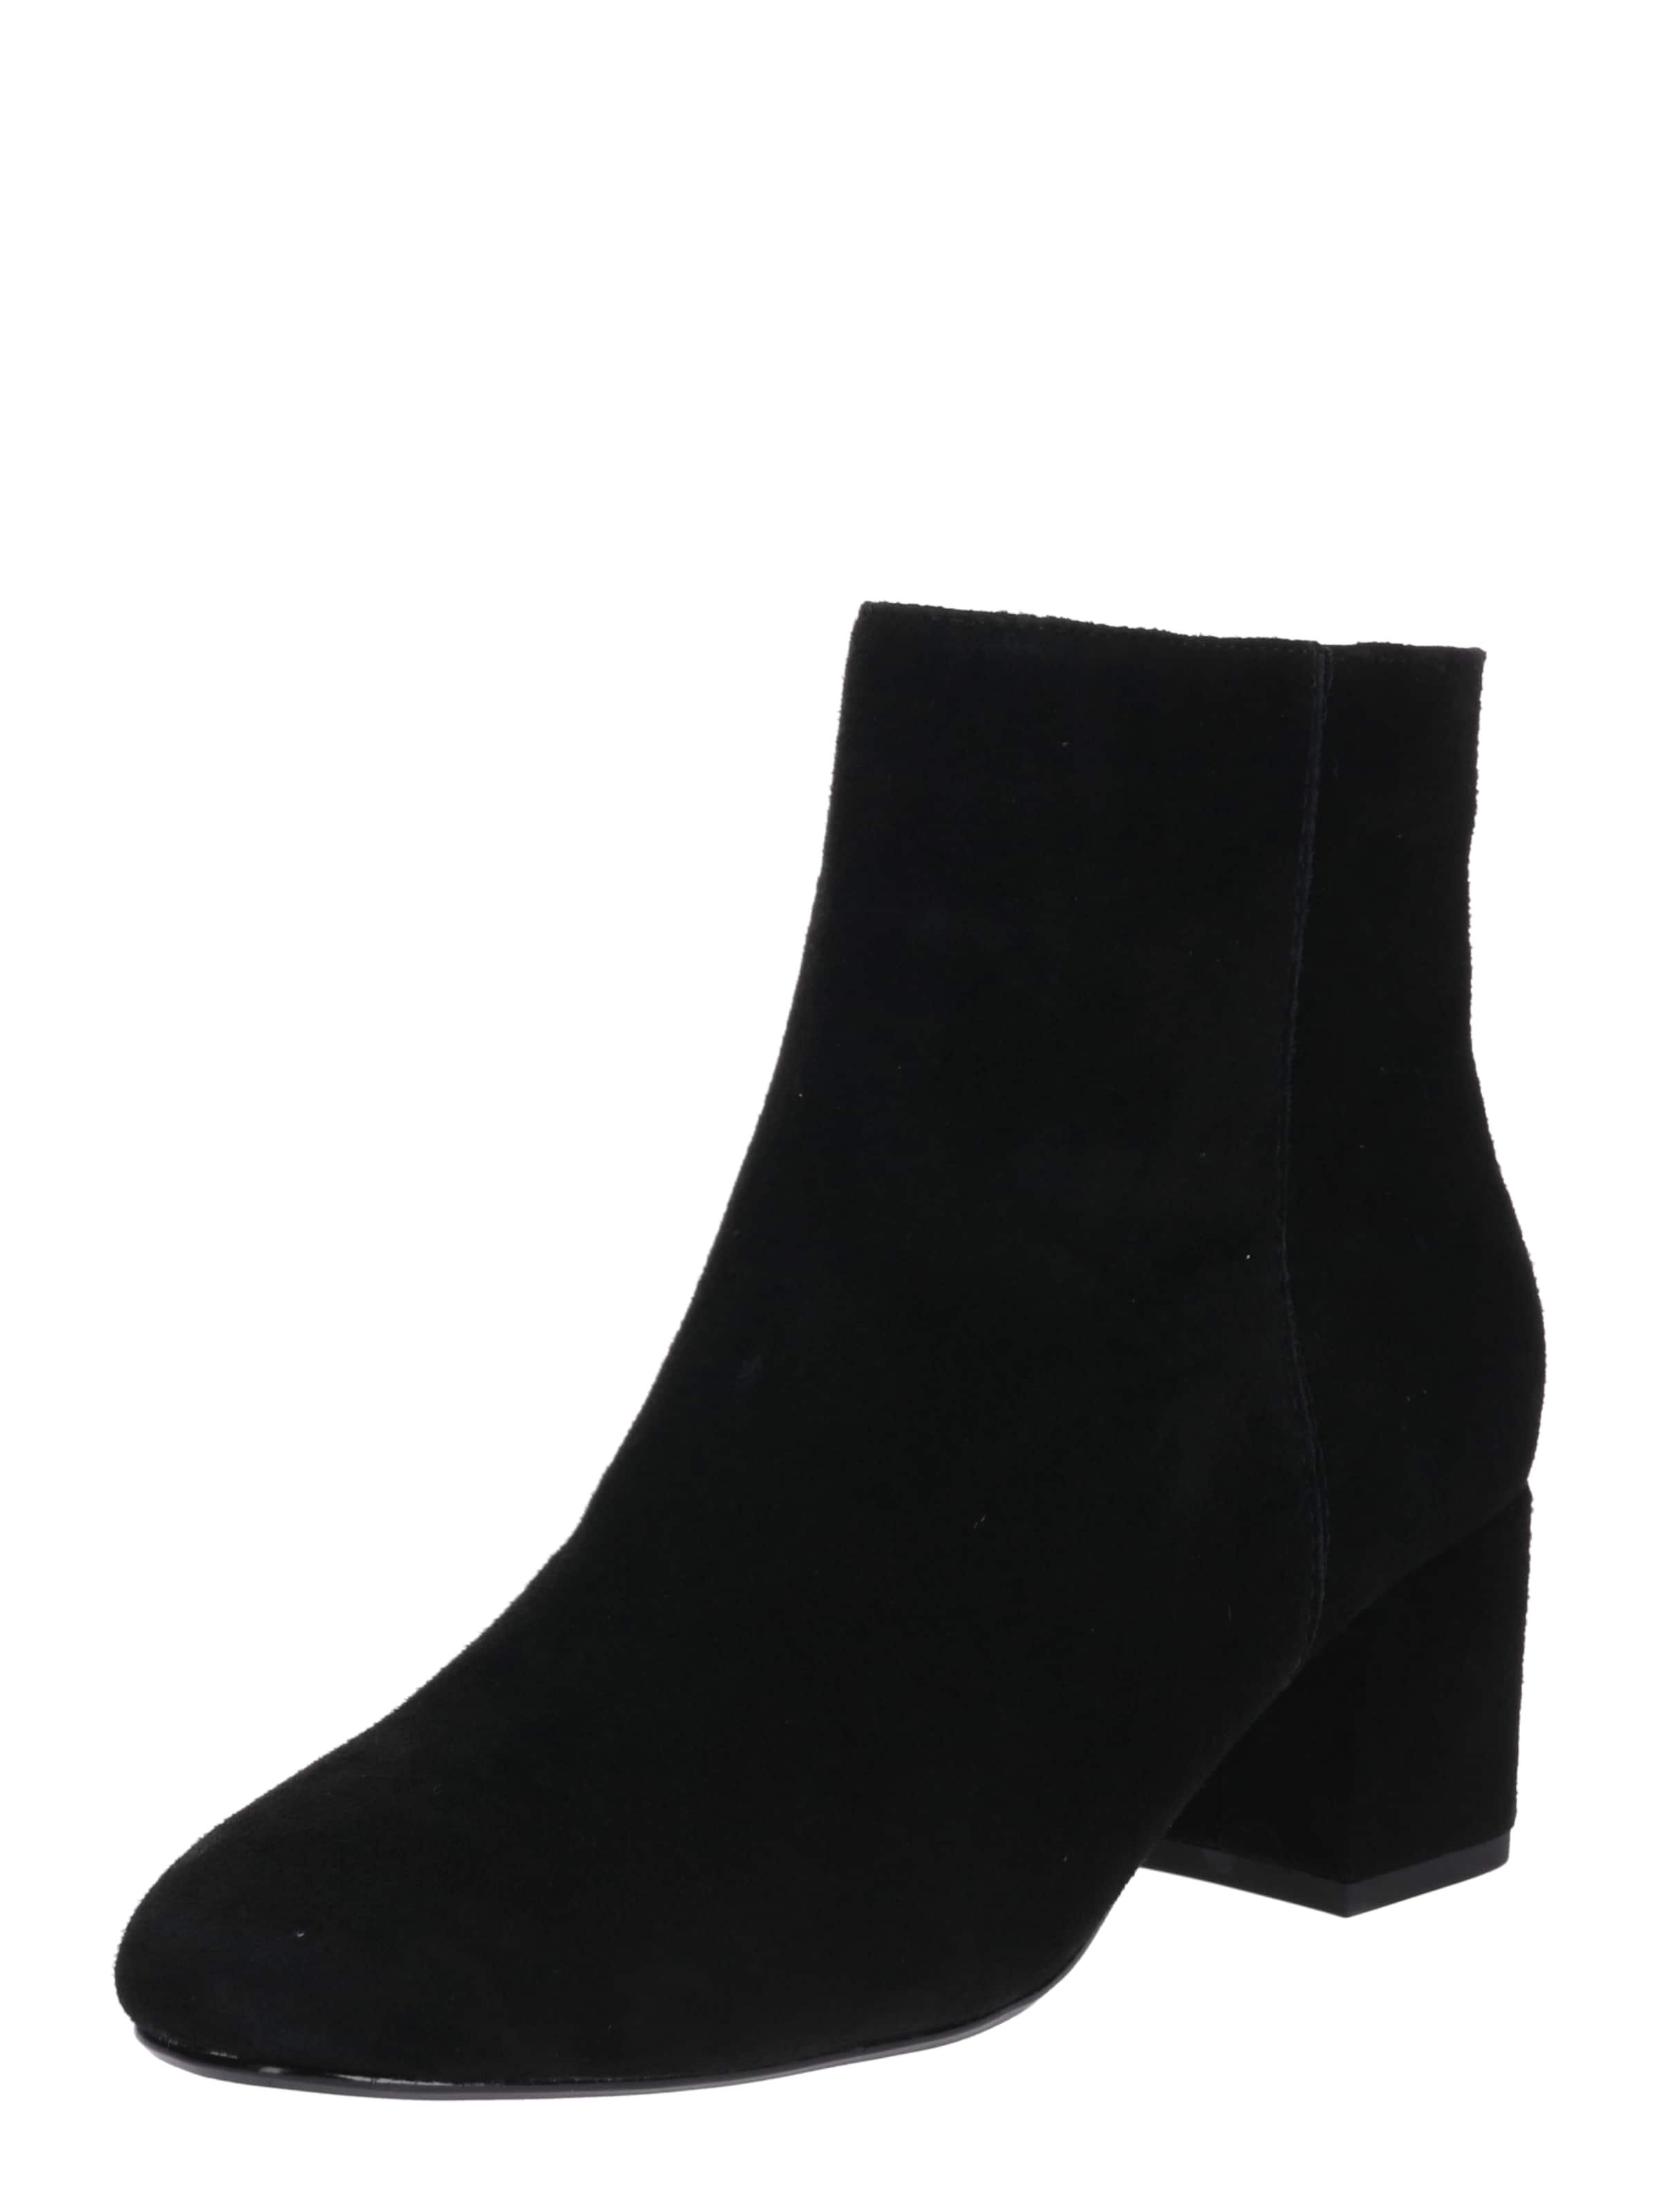 Dune LONDON Stiefelette OLYVEA Verschleißfeste billige Schuhe